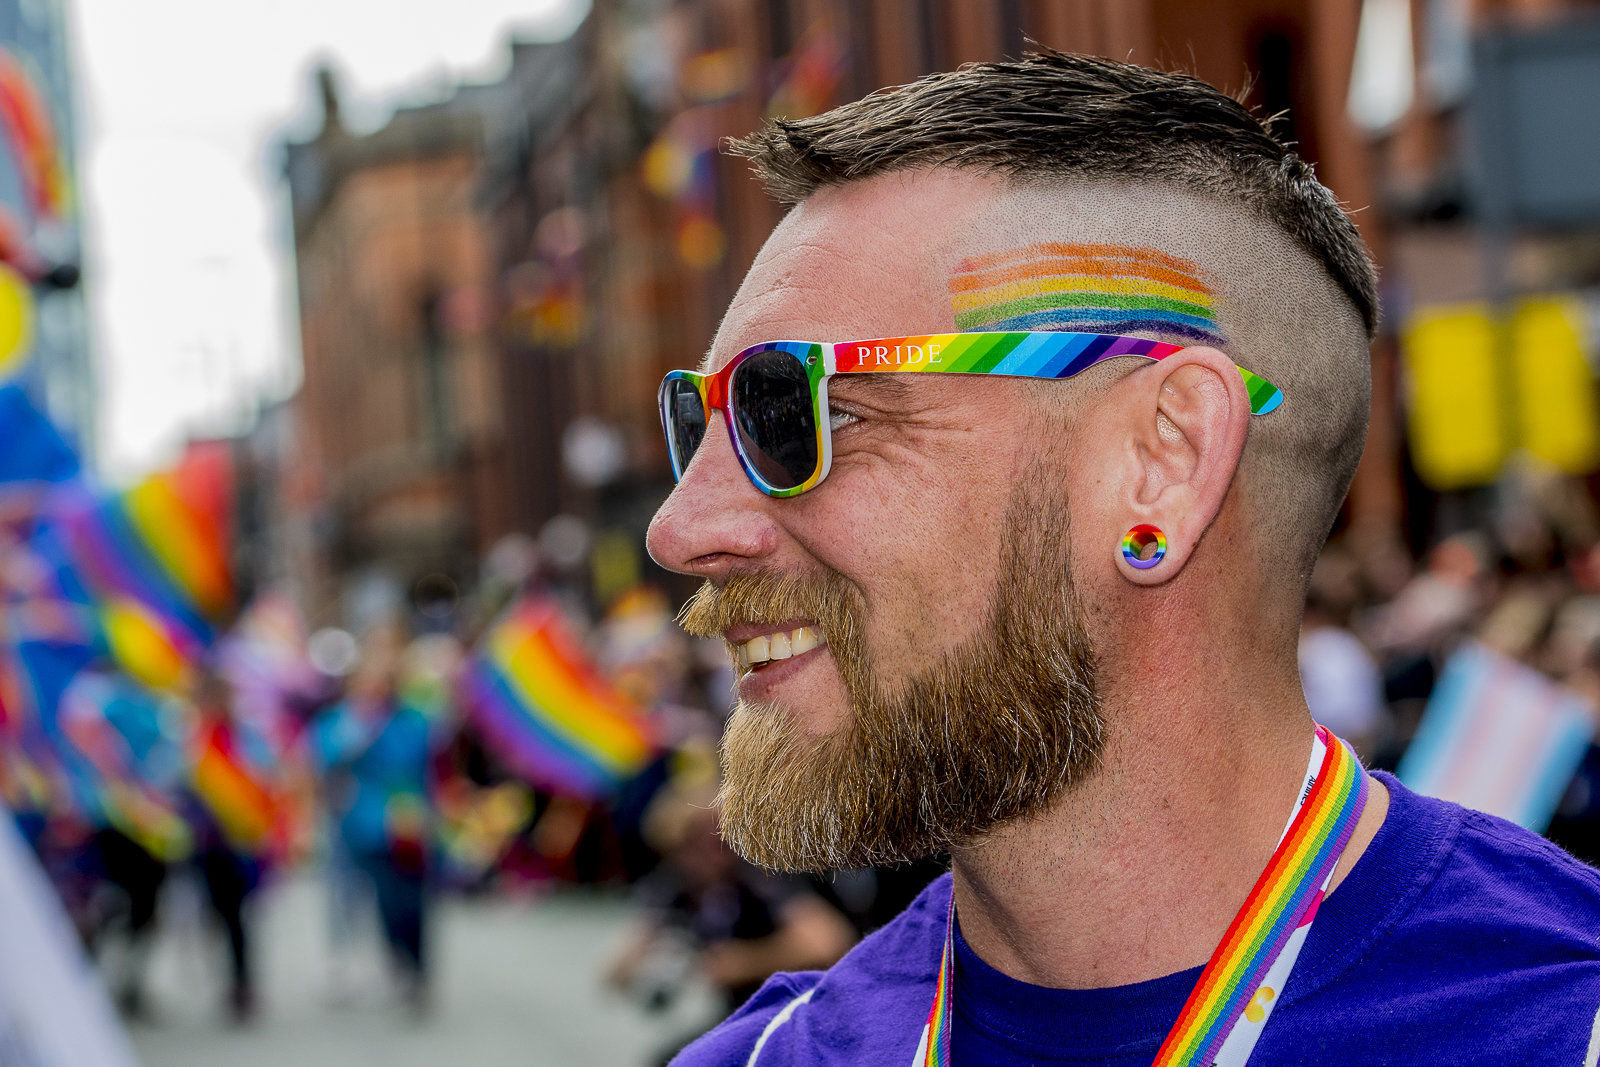 Pride in Manchester